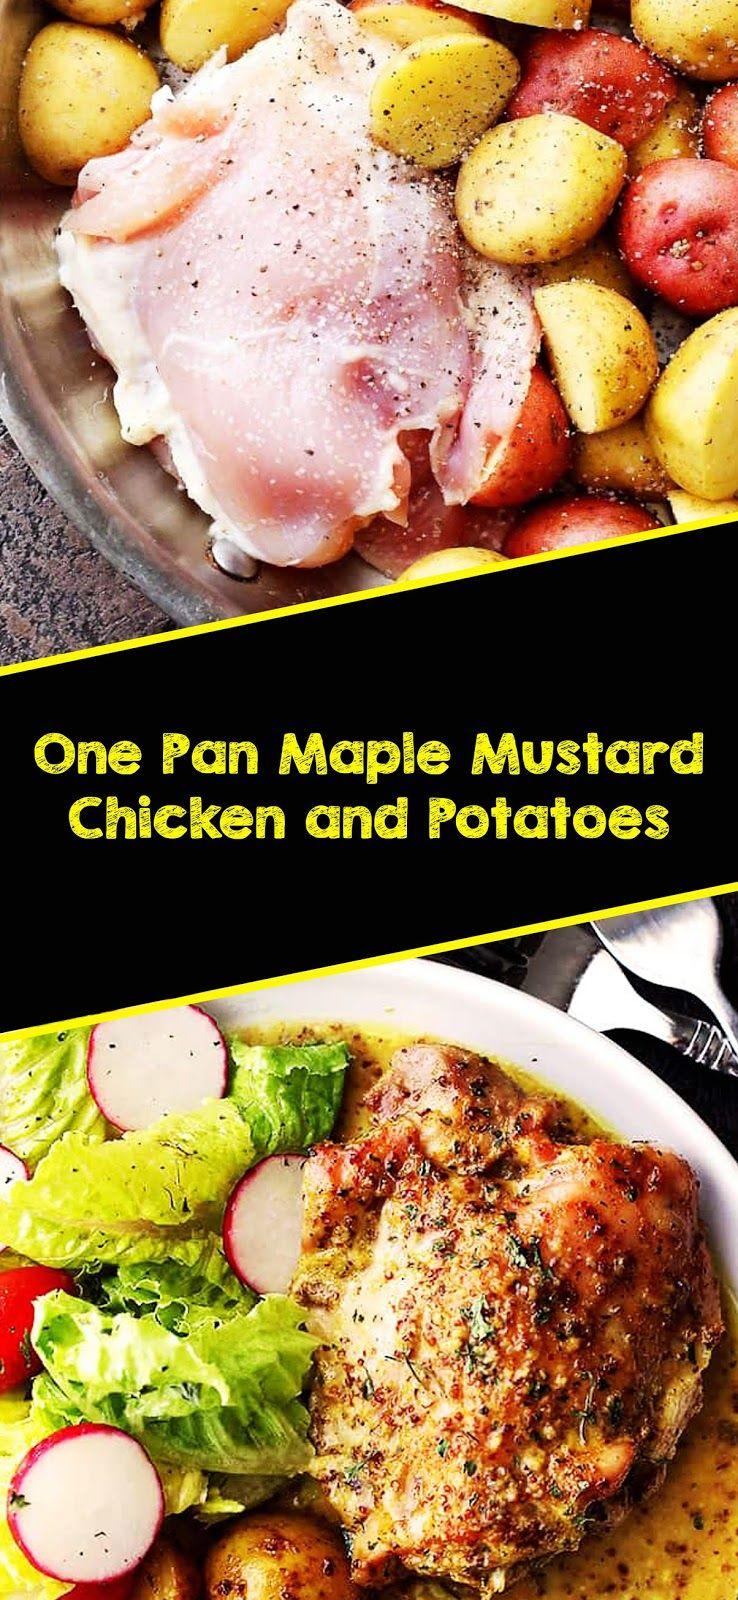 One Pan Maple Mustard Chicken And Potatoes Cooking Rich Resep Ayam Resep Ayam Sehat Resep Makanan